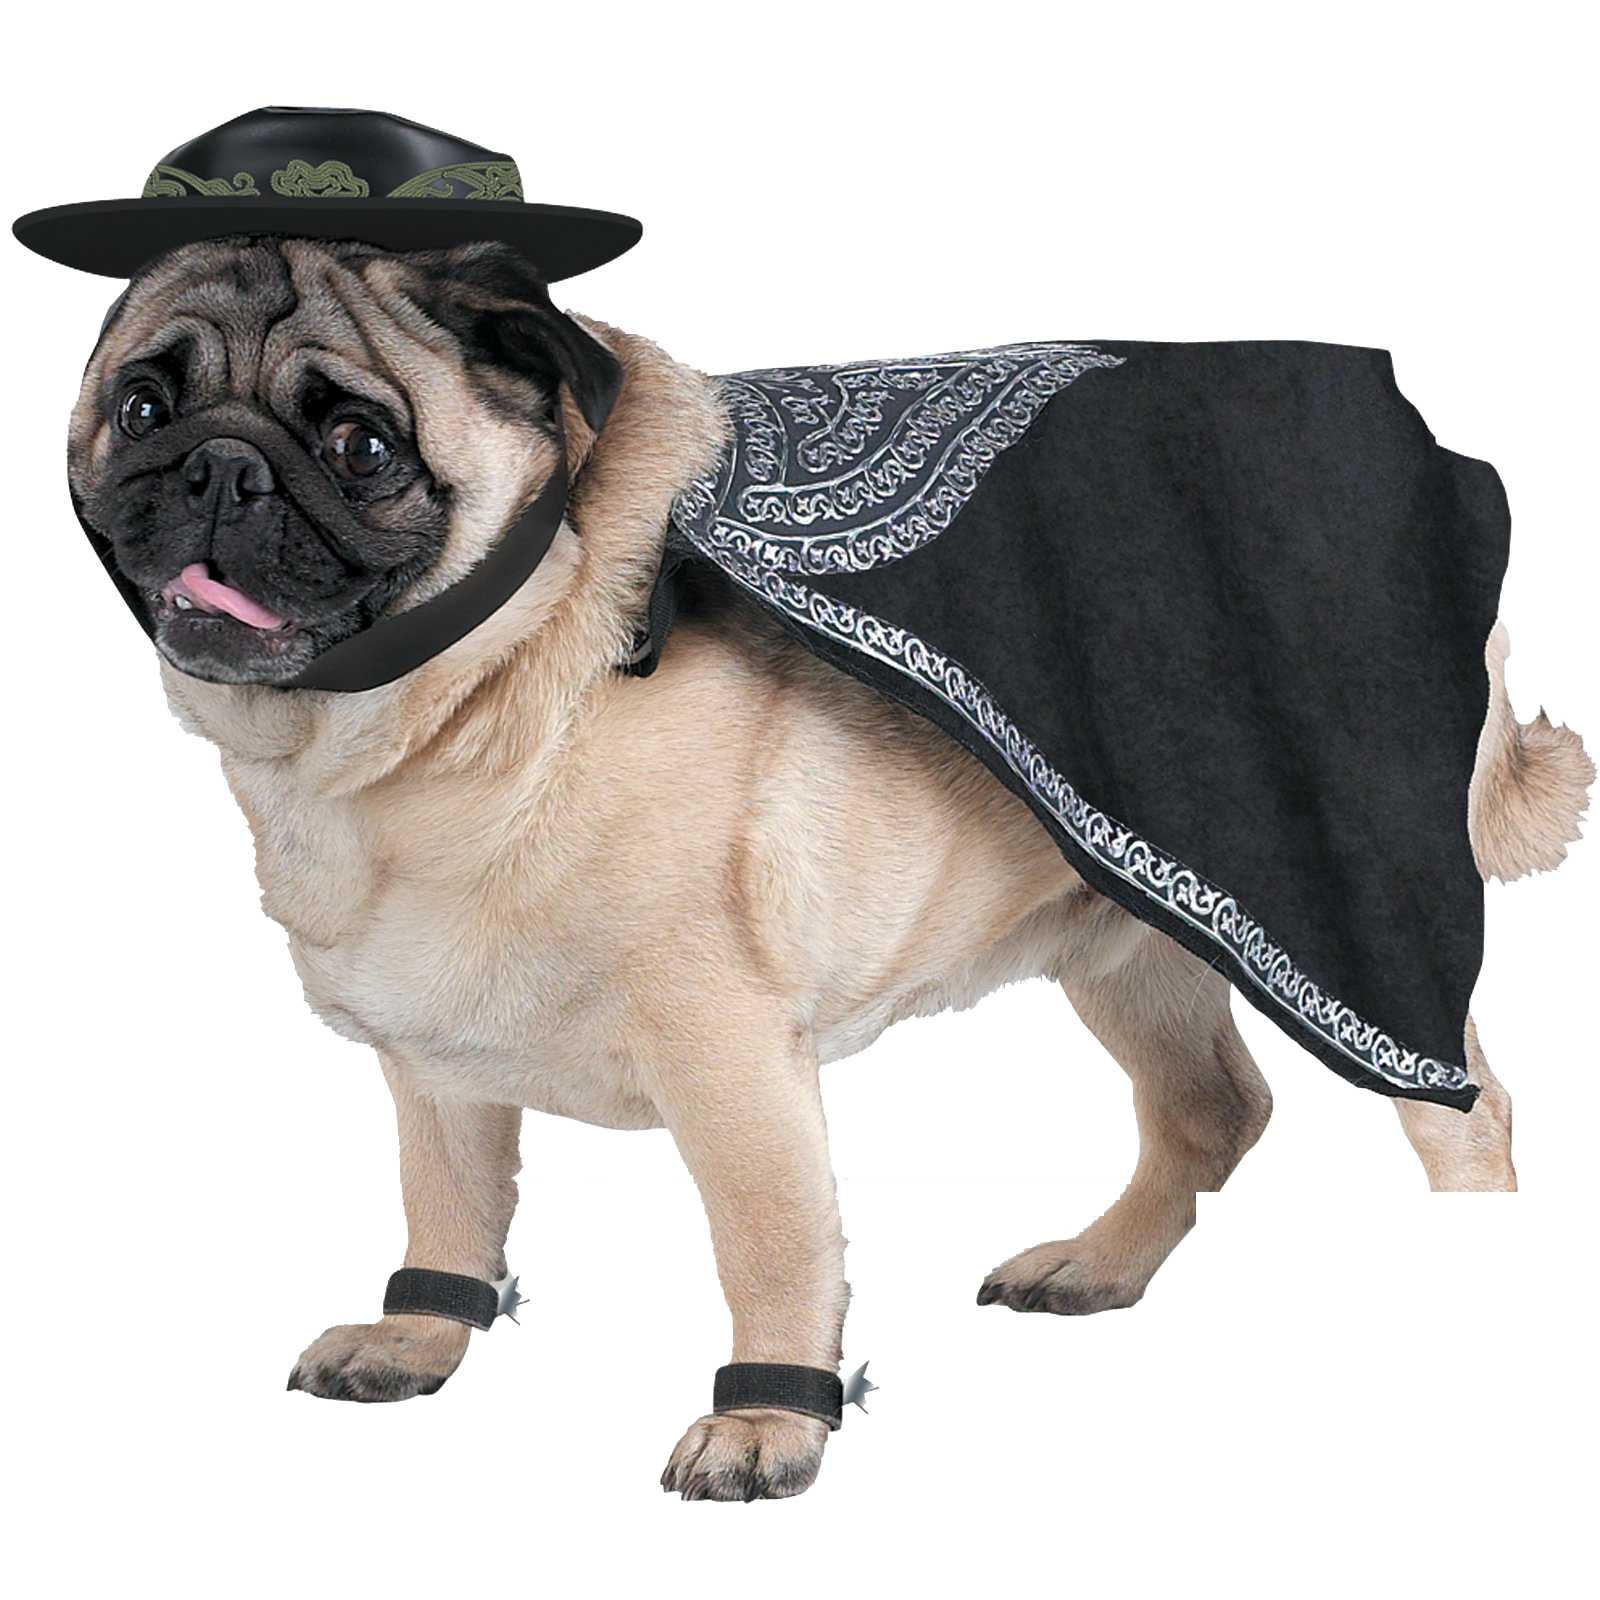 Zoro the Pug